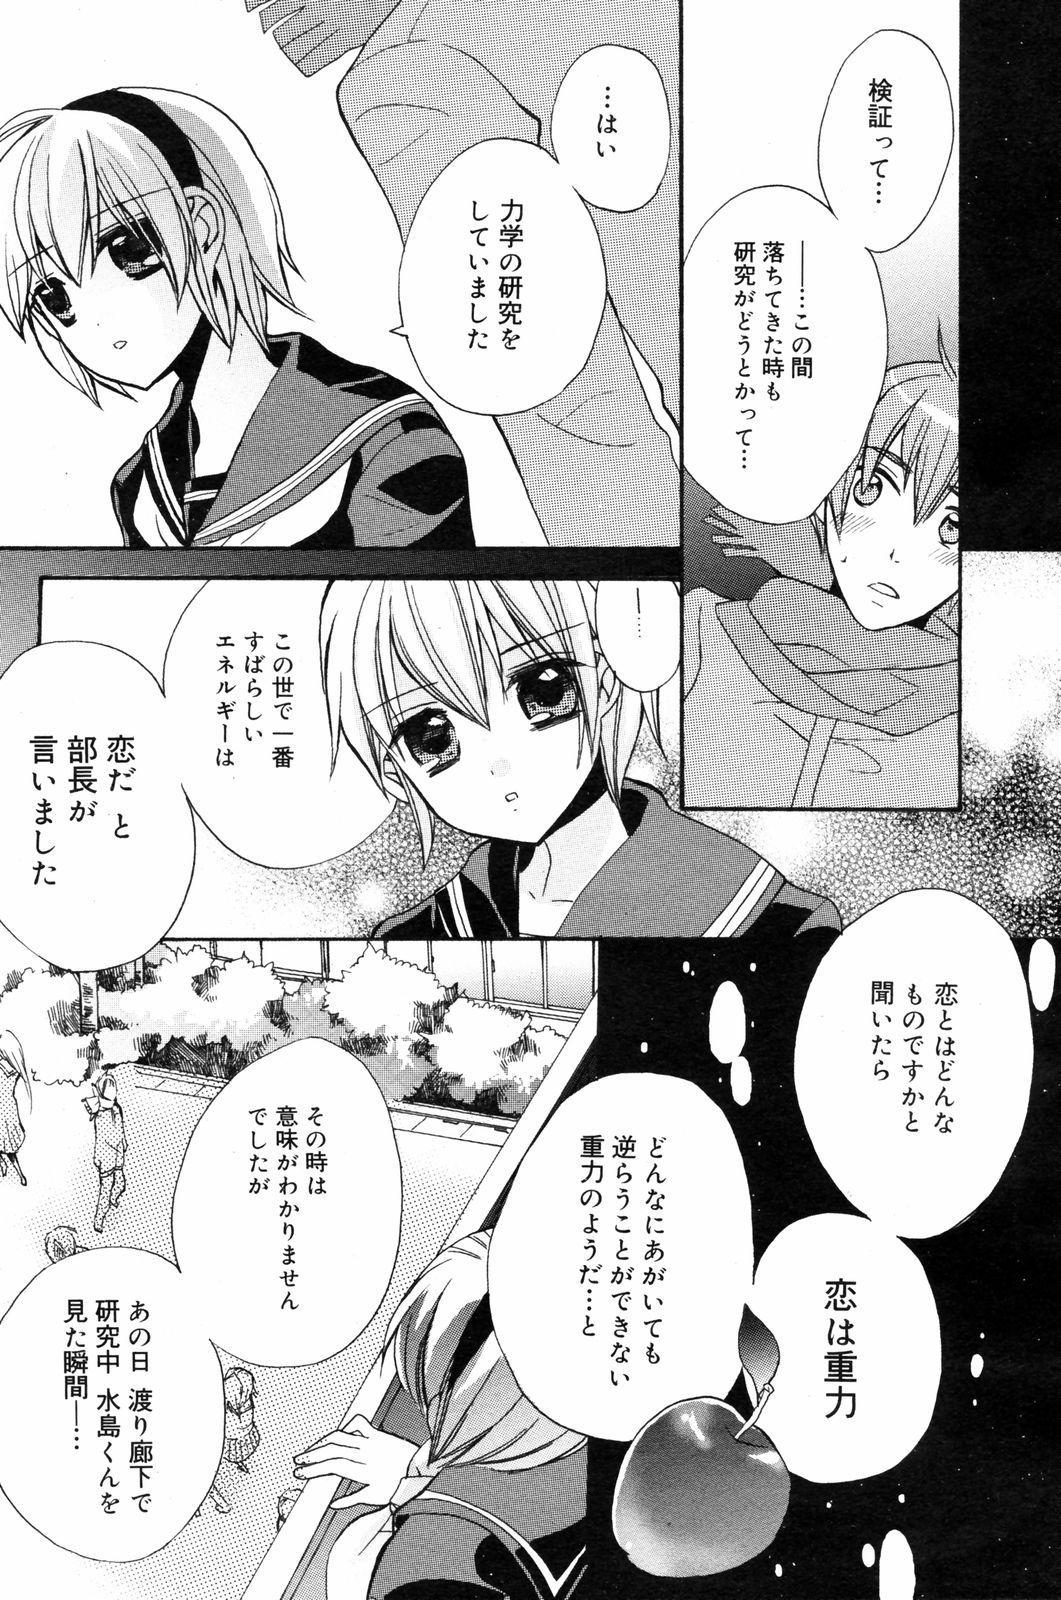 Manga Bangaichi 2008-03 107